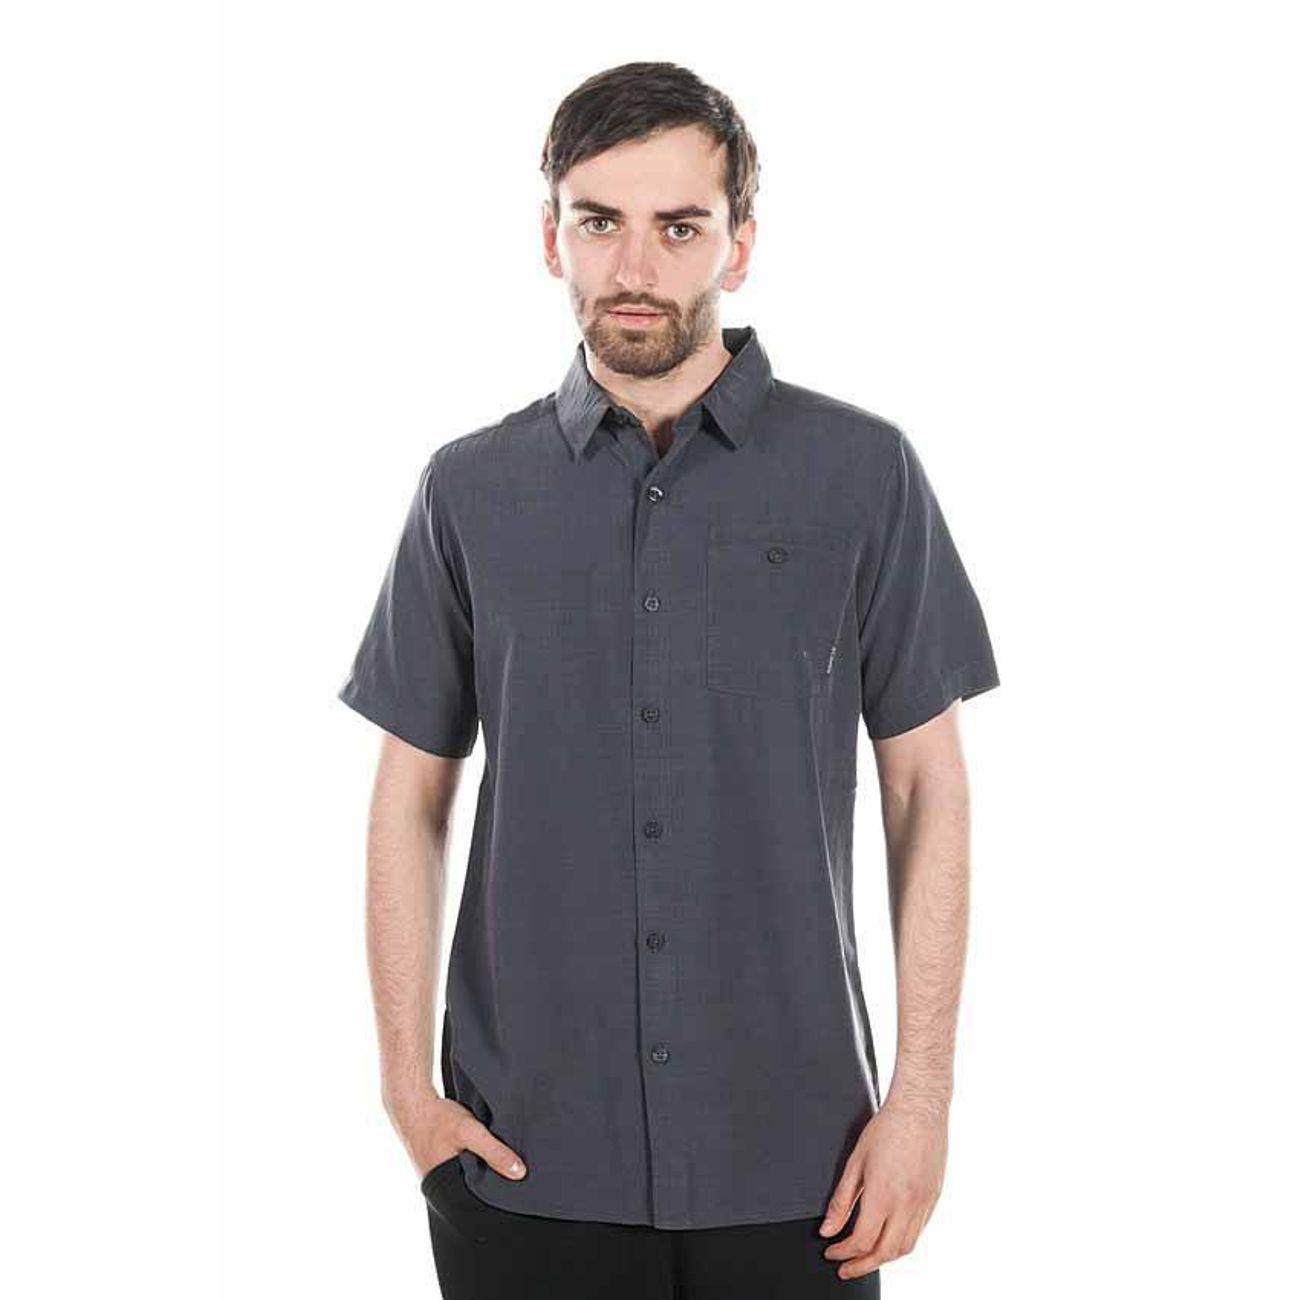 04ec984e04b2d columbia-mossy-trail-ss-shirt-india-ink--slub_1_v1.jpeg